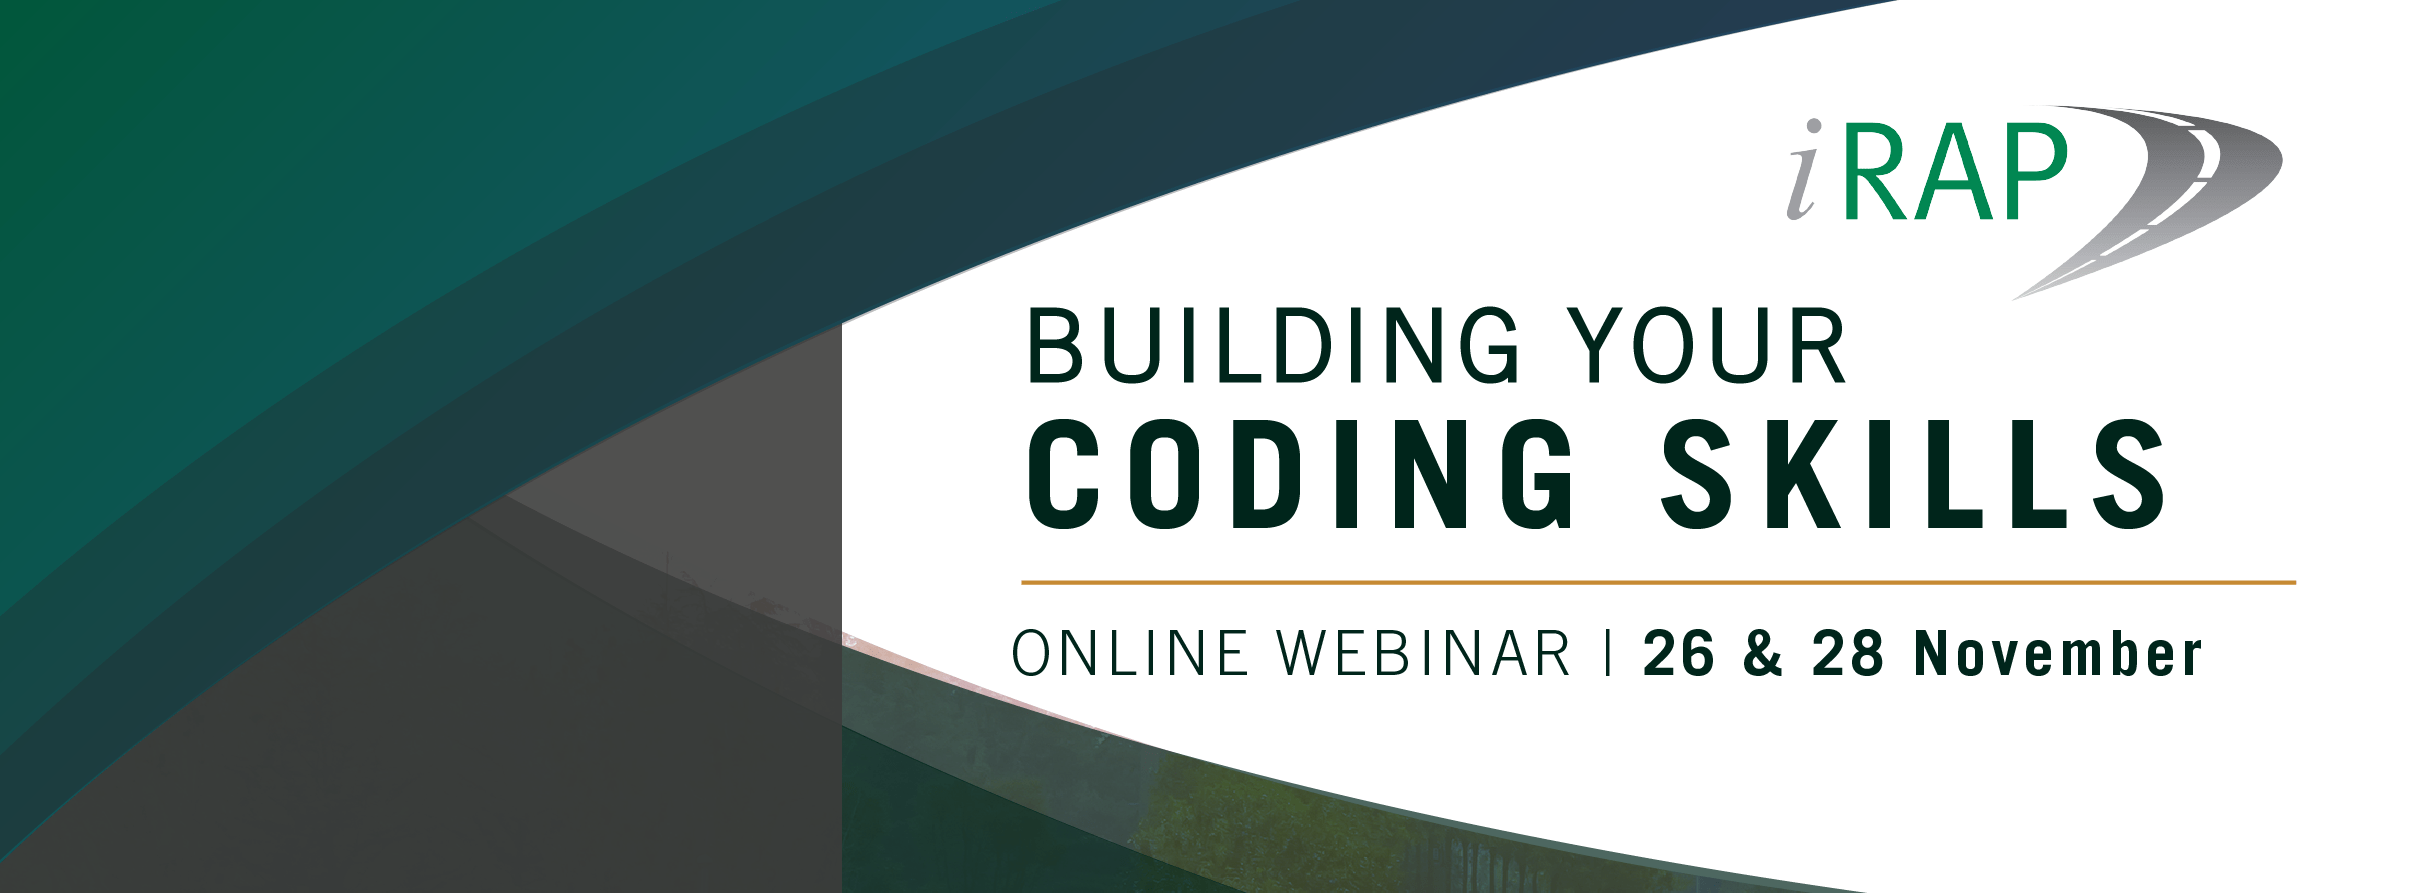 Building Your Coding Skills Two Part Webinar – November 2019